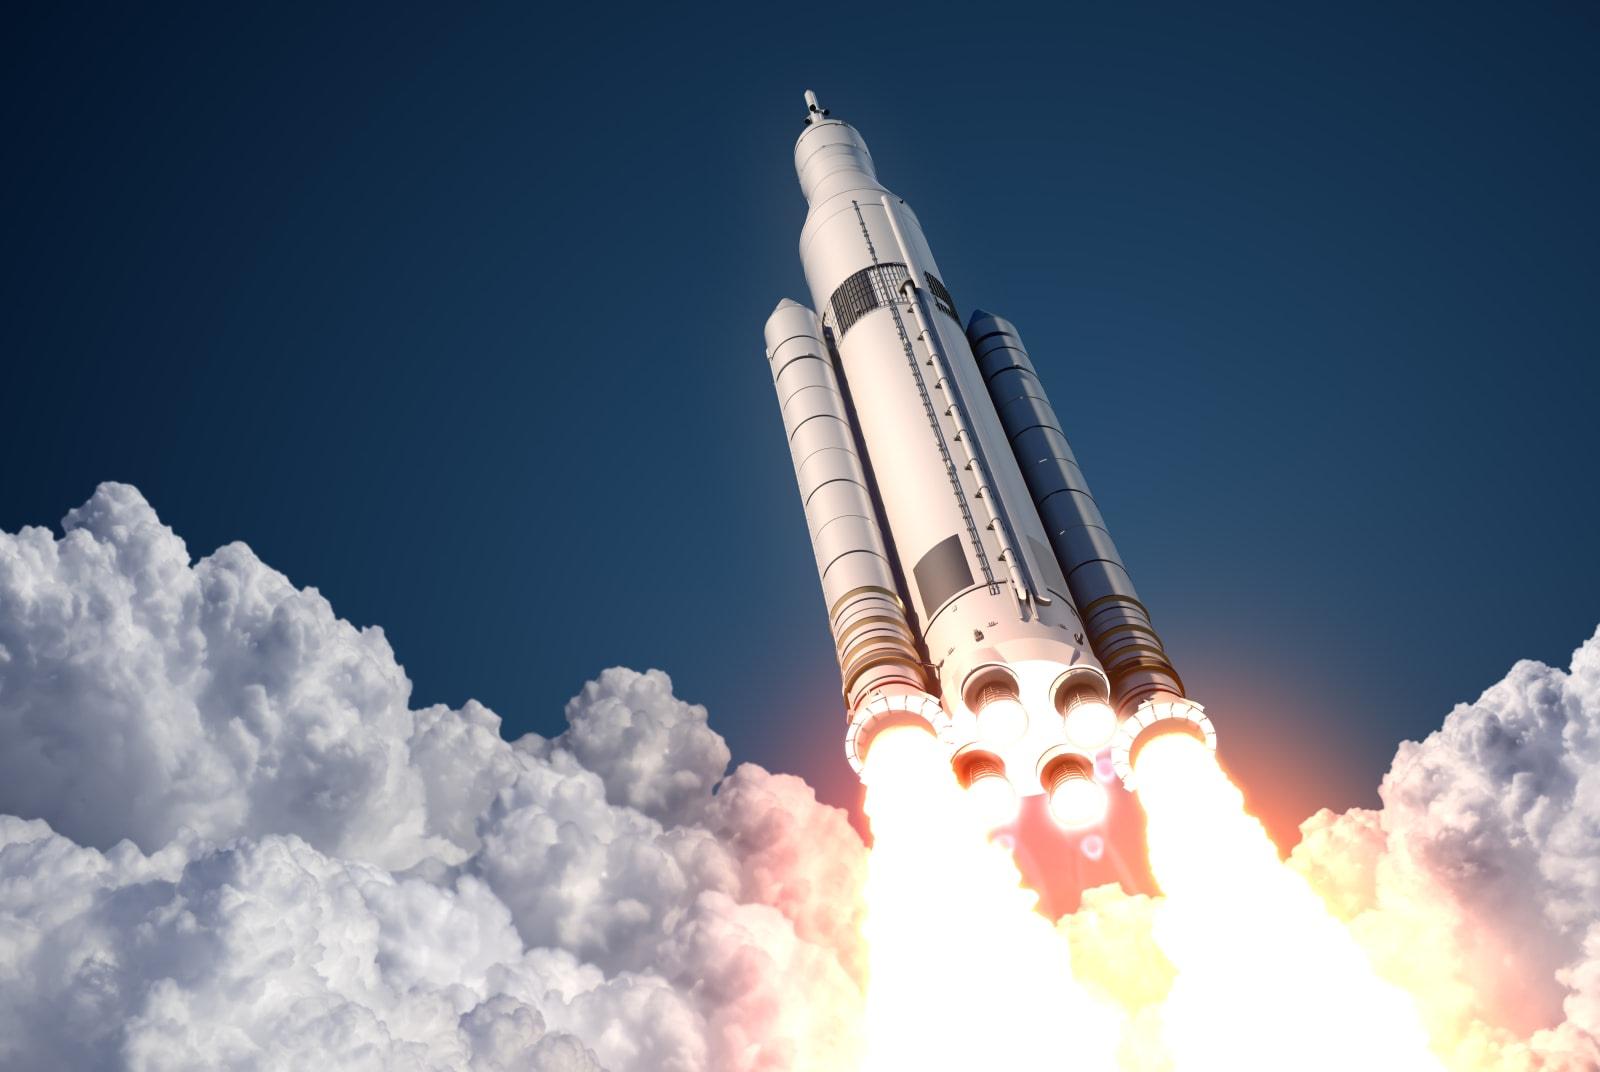 nasa water rocket launcher plans - photo #42